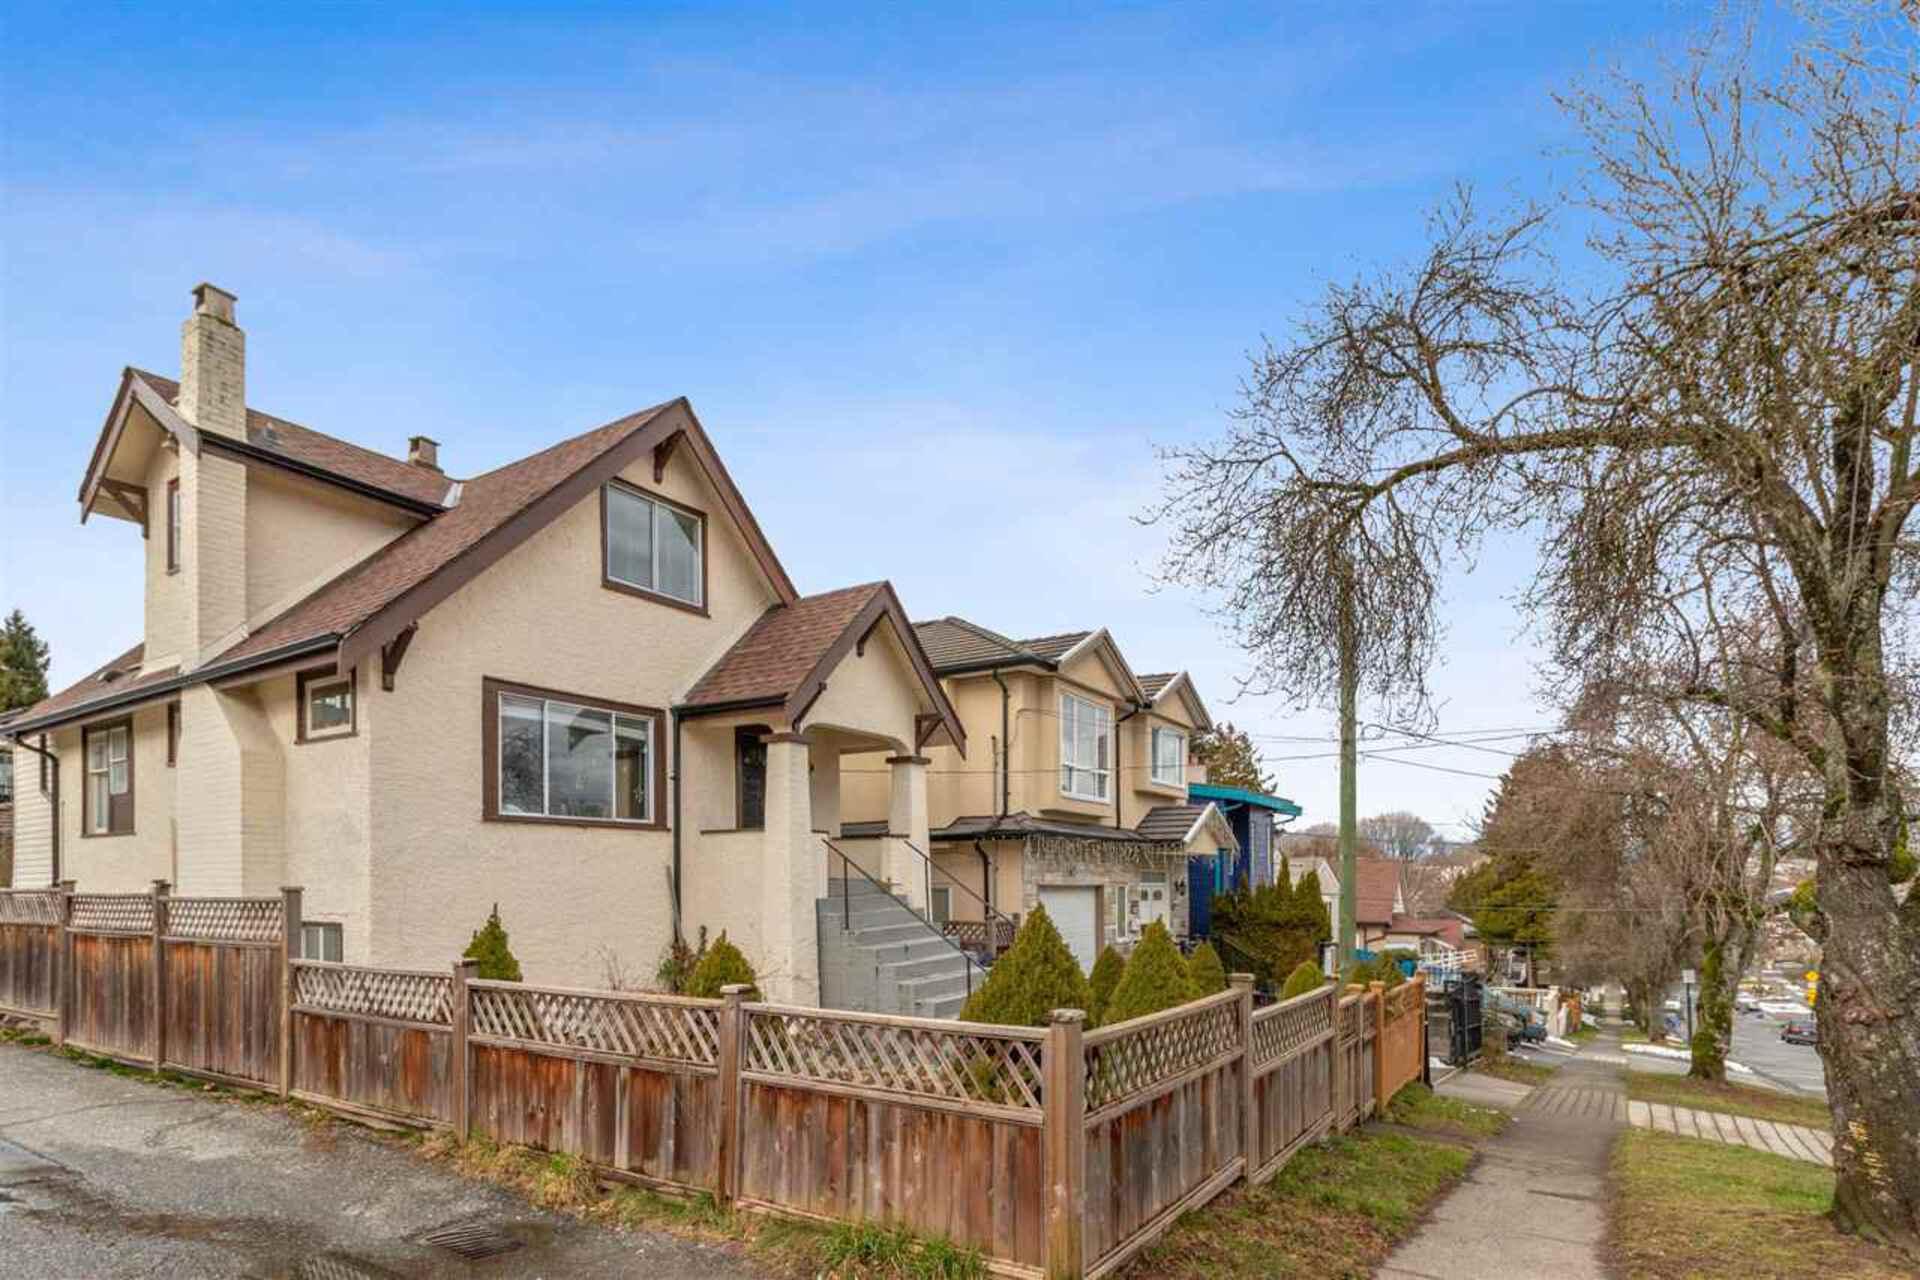 5375-mckinnon-street-collingwood-ve-vancouver-east-15 at 5375 Mckinnon Street, Collingwood VE, Vancouver East